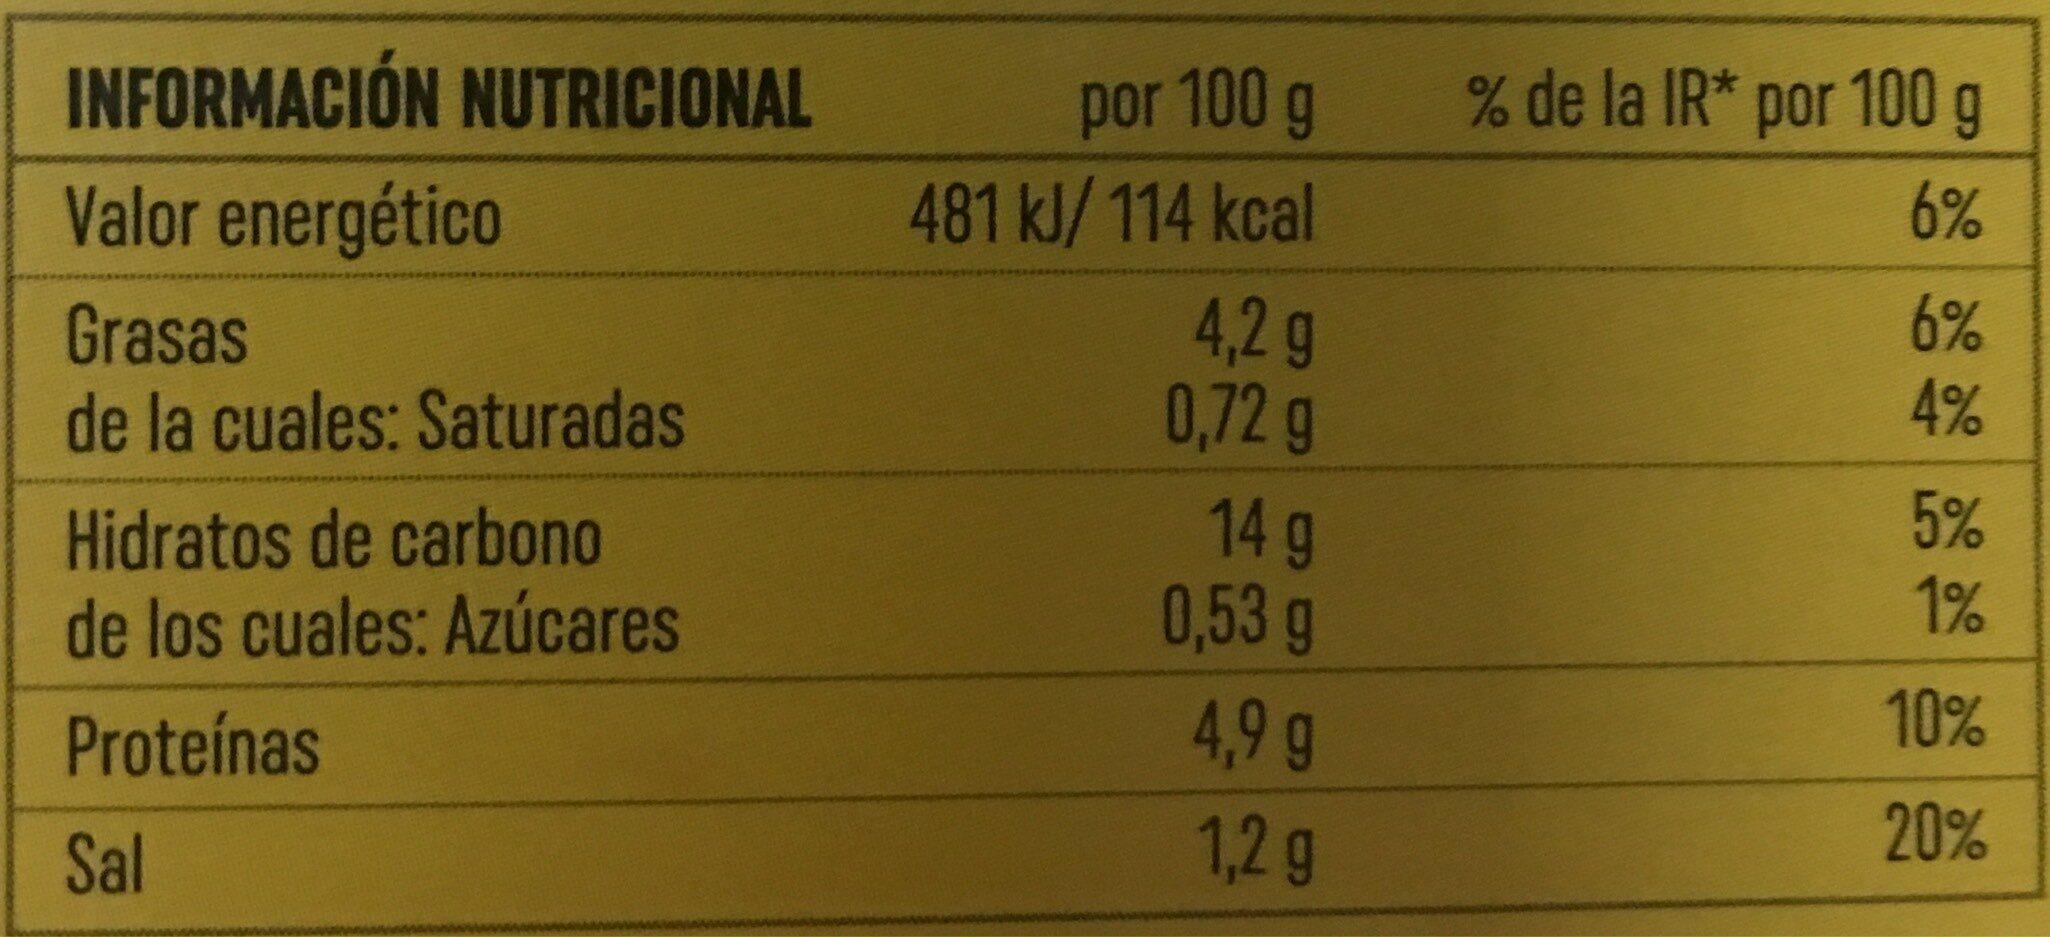 Arroz negro - Nutrition facts